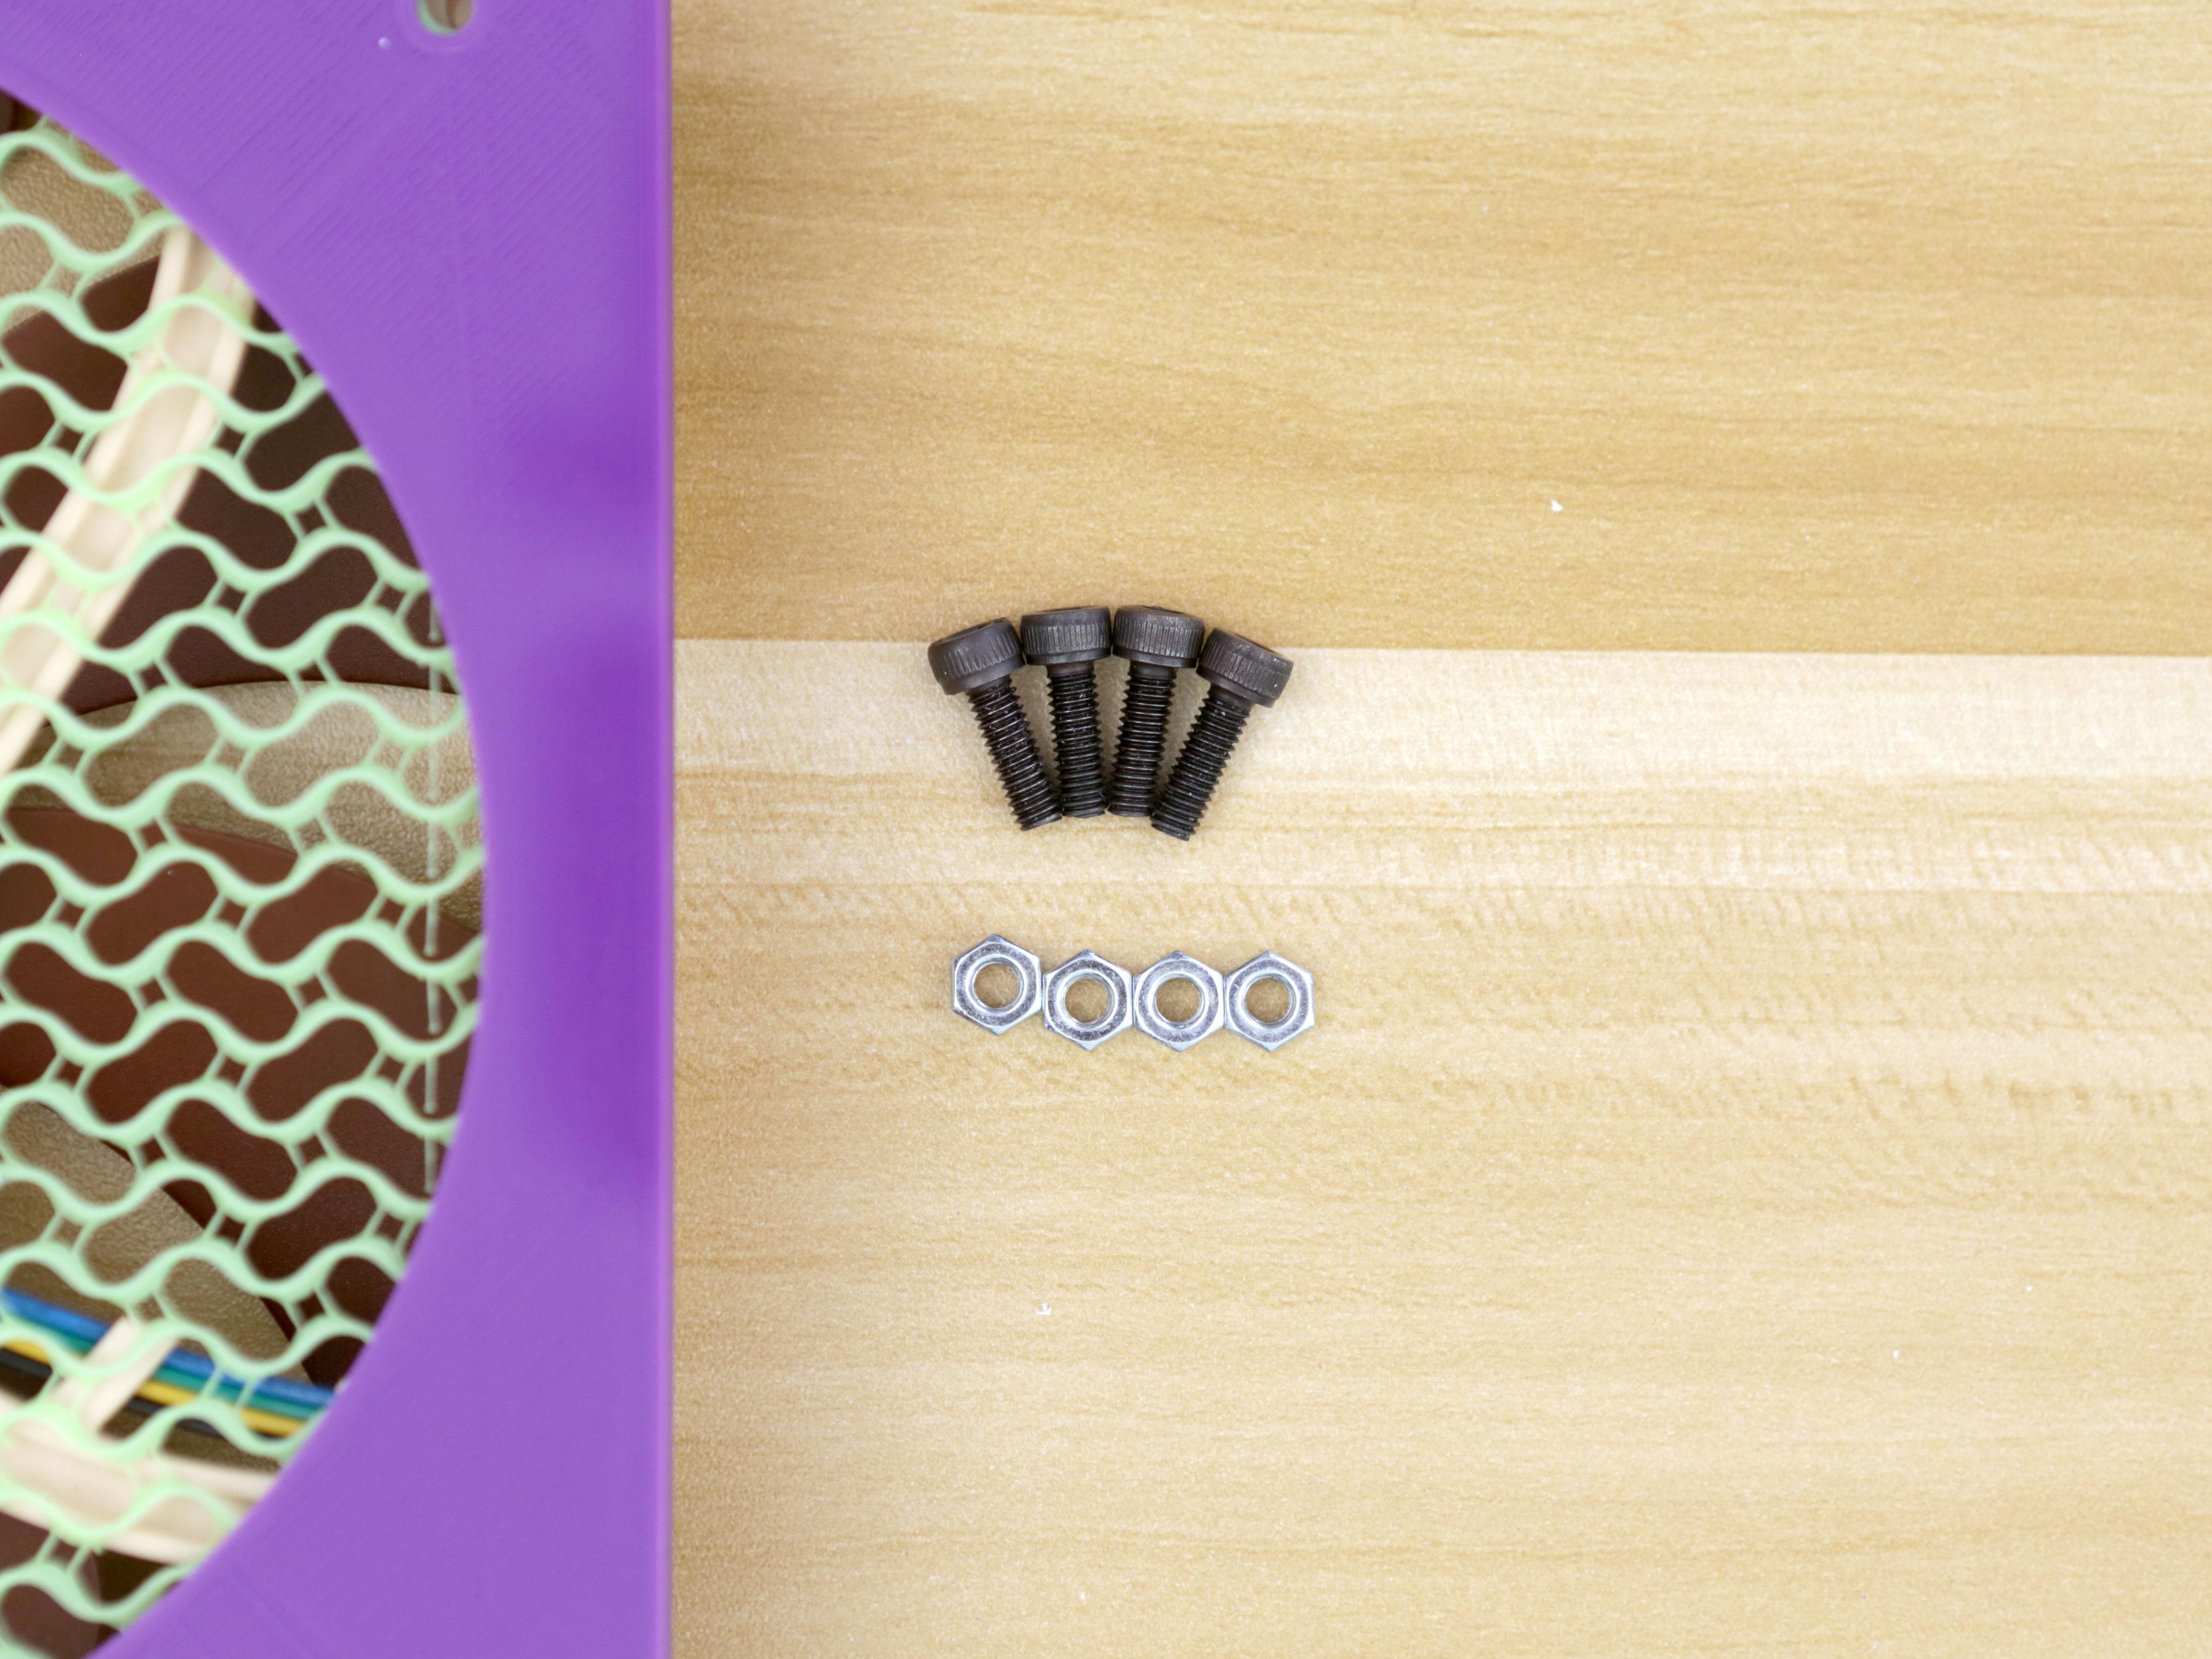 3d_printing_backcover-fan-screws.jpg